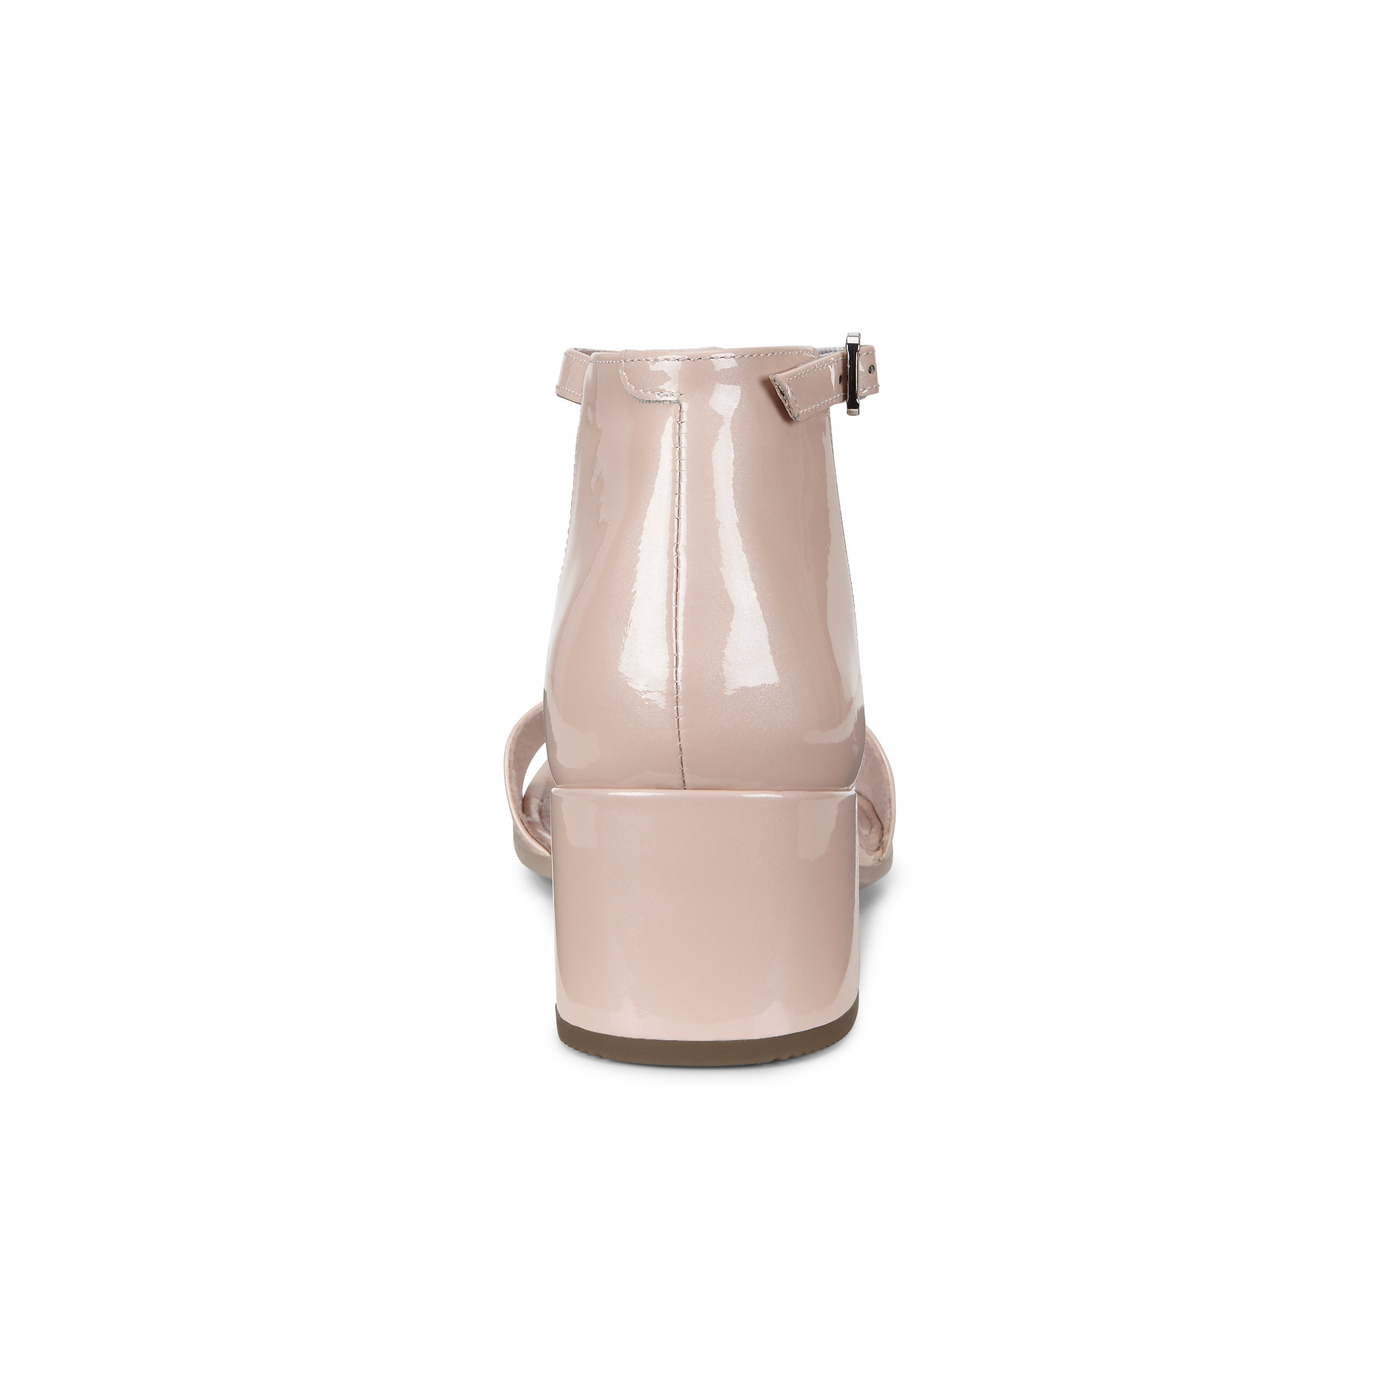 ECCO SHAPE BLOCK SANDAL Ankle Strap 35mm